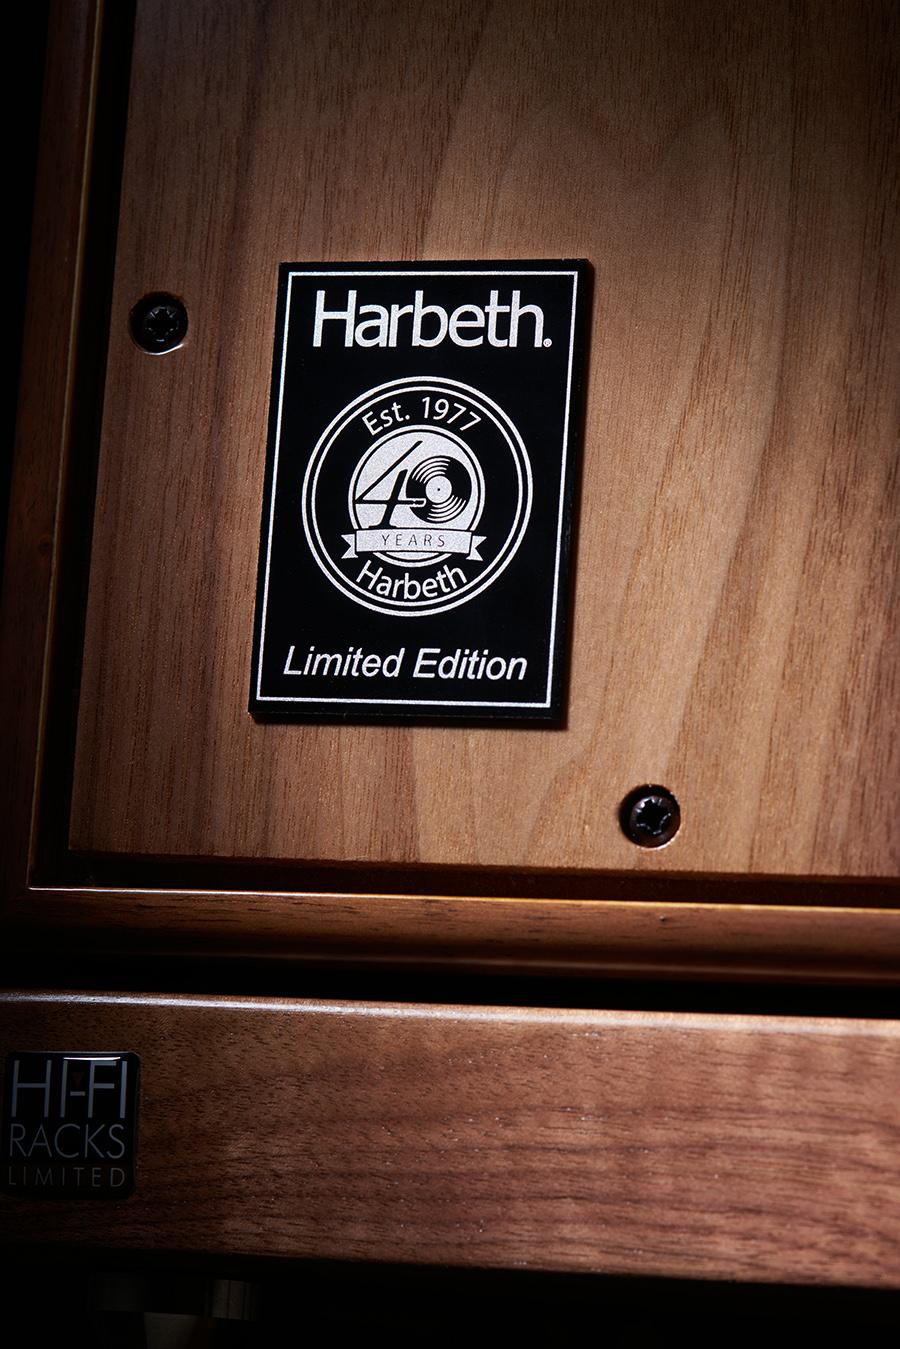 HarbethHL5 Plus Walnut